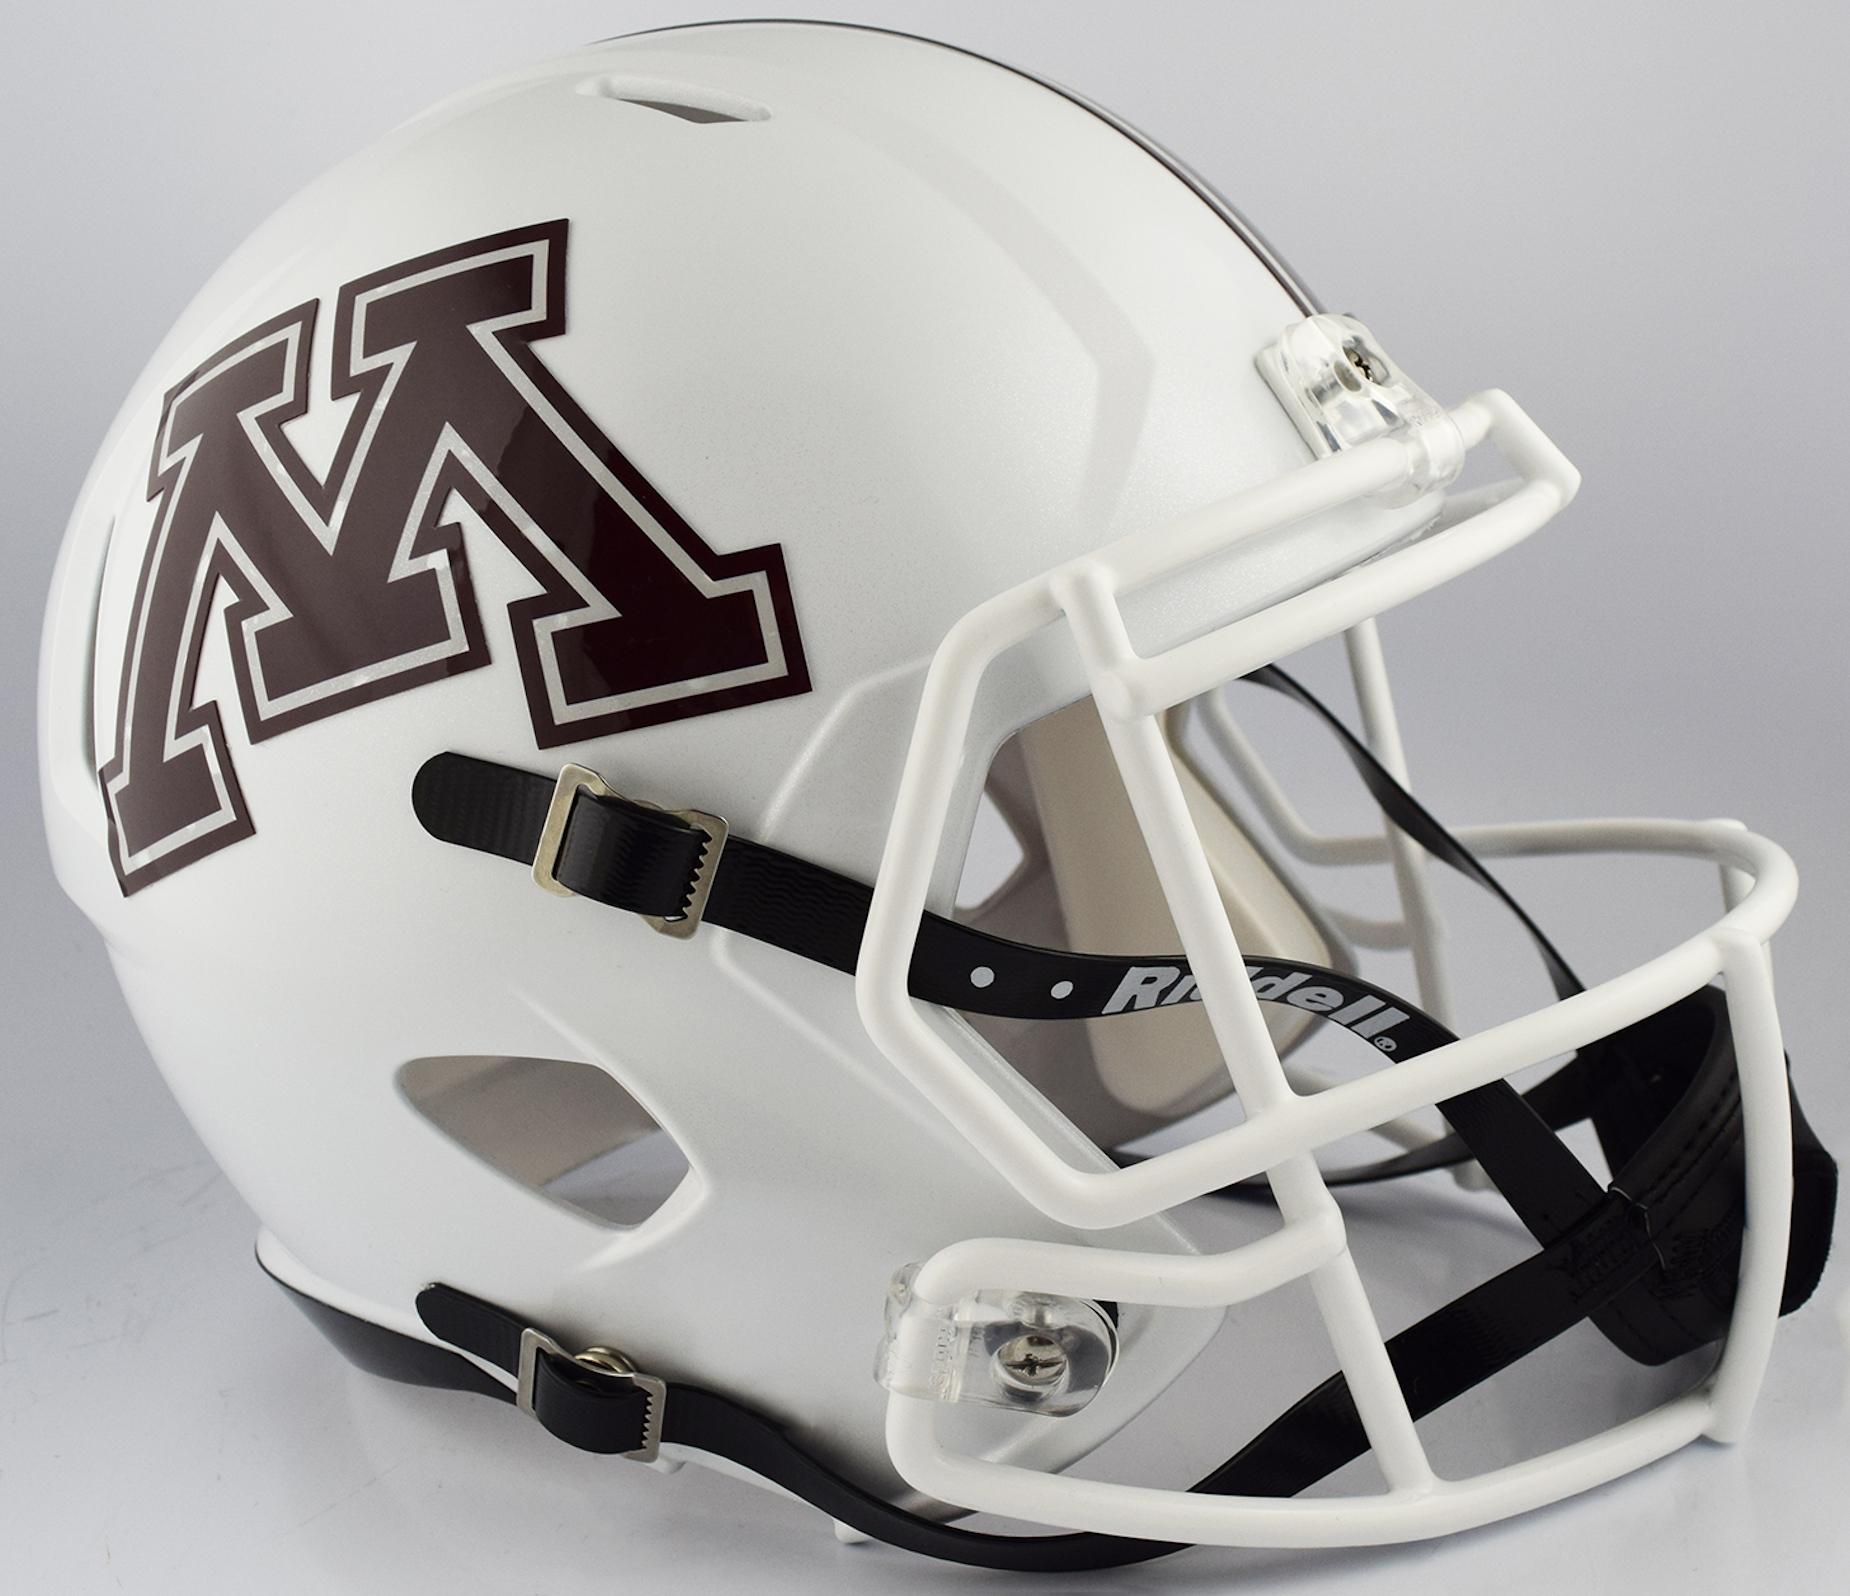 Minnesota Golden Gophers Speed Replica Football Helmet